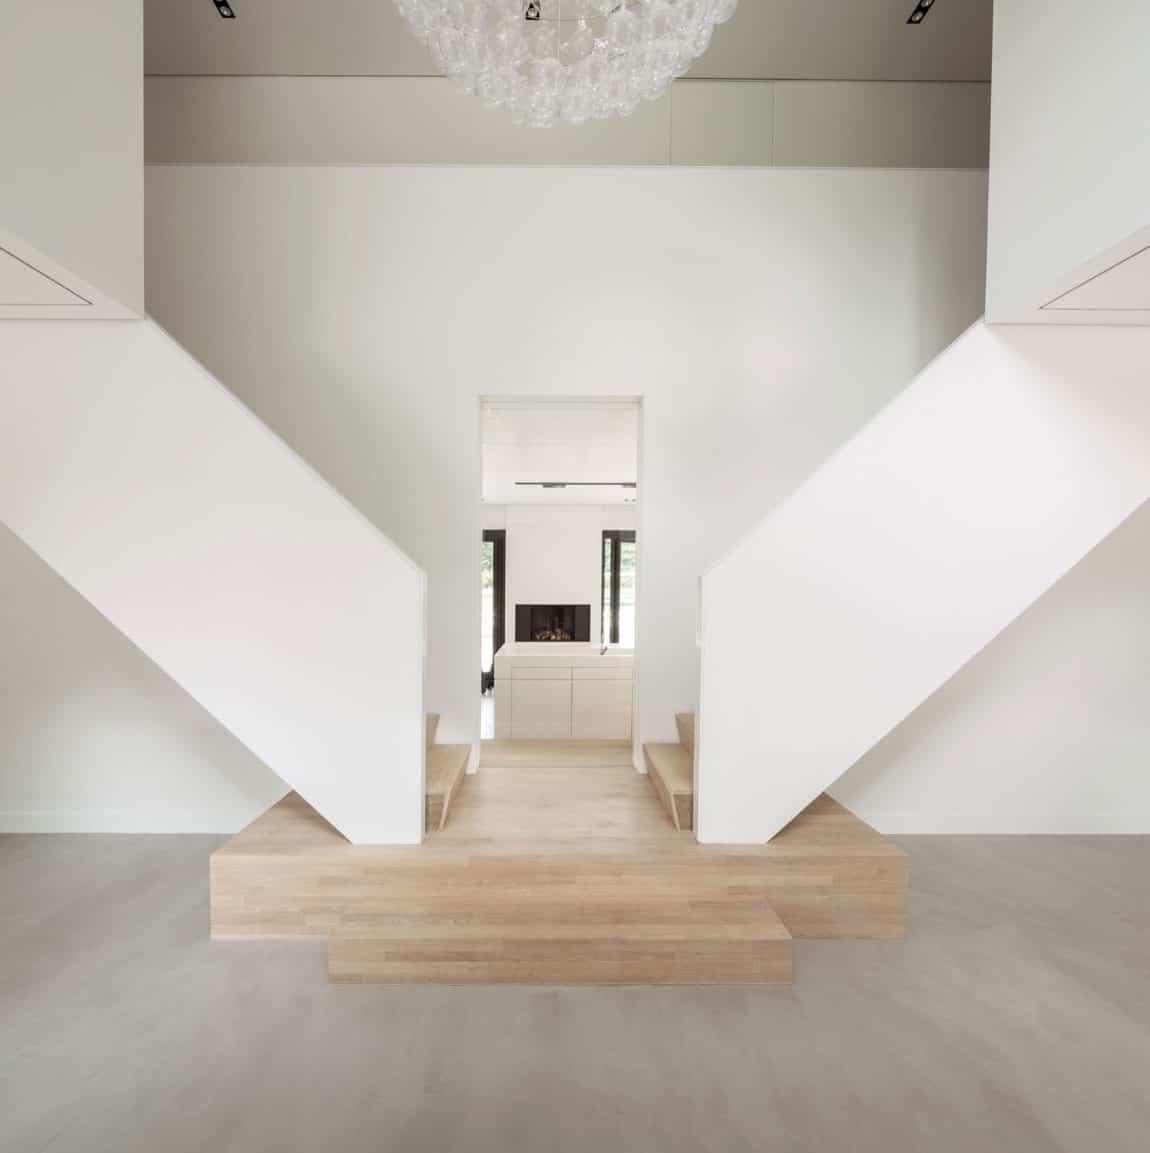 Villa Huizen by De Brouwer Binnenwerk (14)